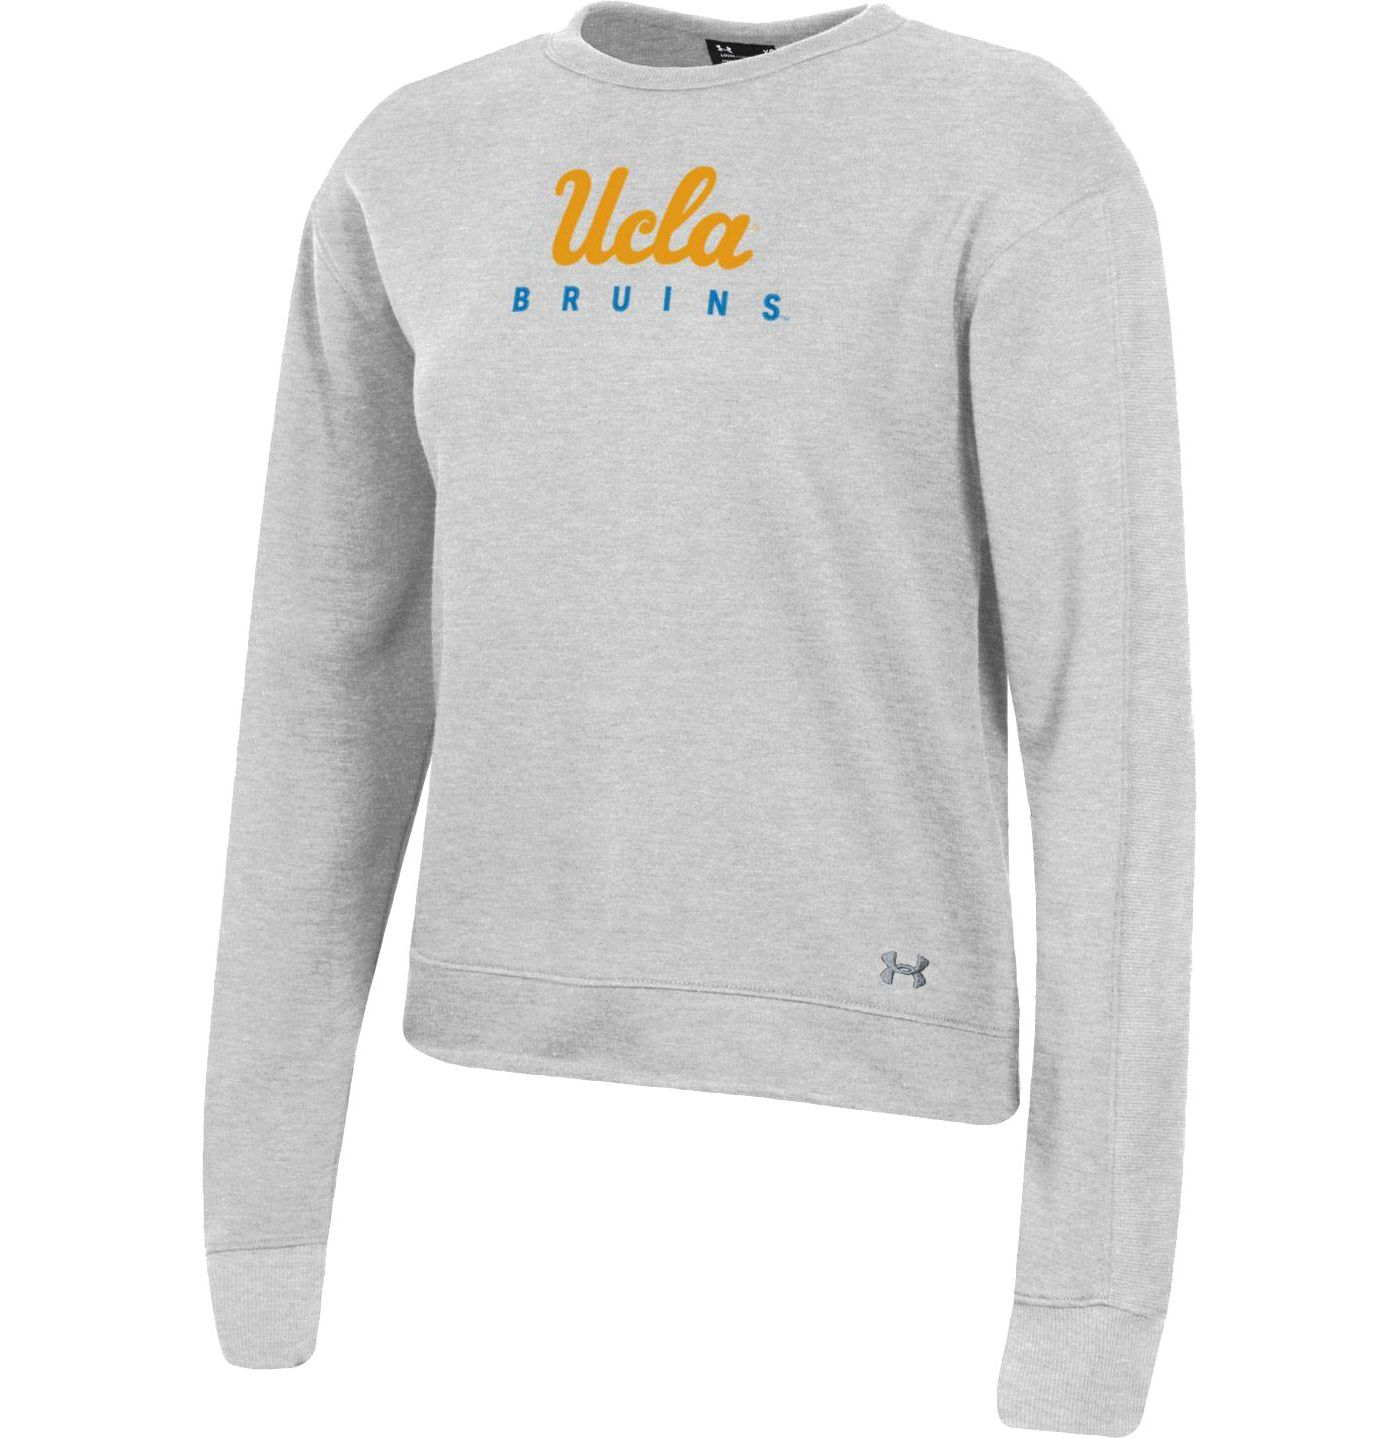 Under Armour Women's UCLA Bruins Silver All Day Fleece Crew-Neck Sweatshirt